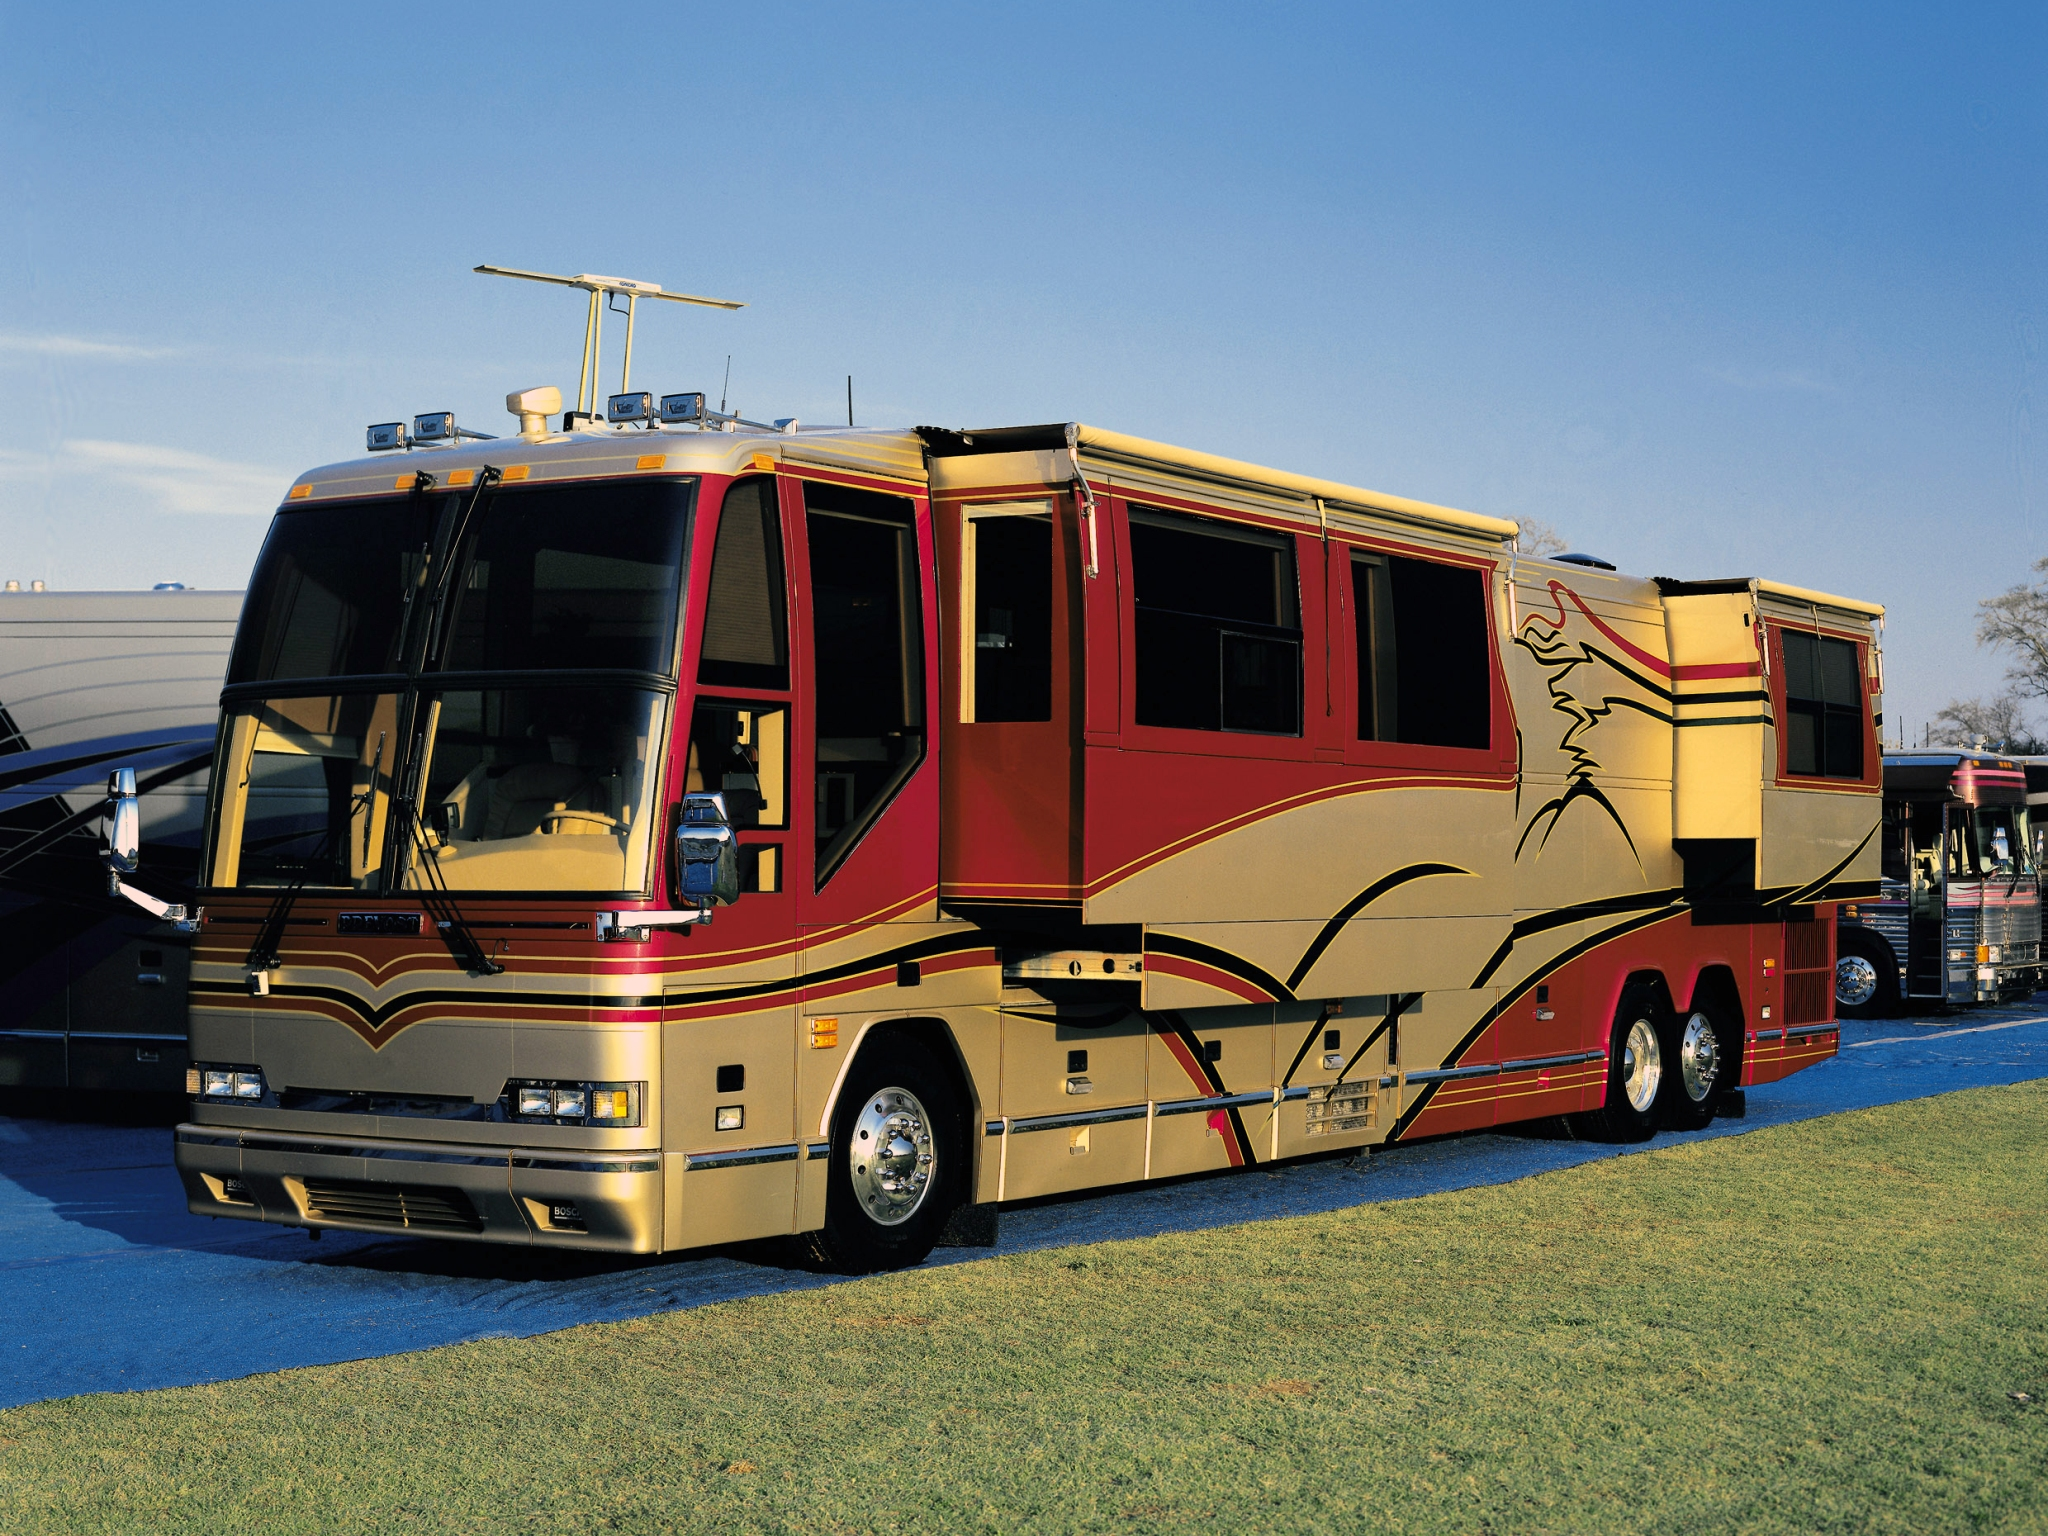 2004 Prevost H3 45 Vip Motorhome Bus Buses Wallpaper